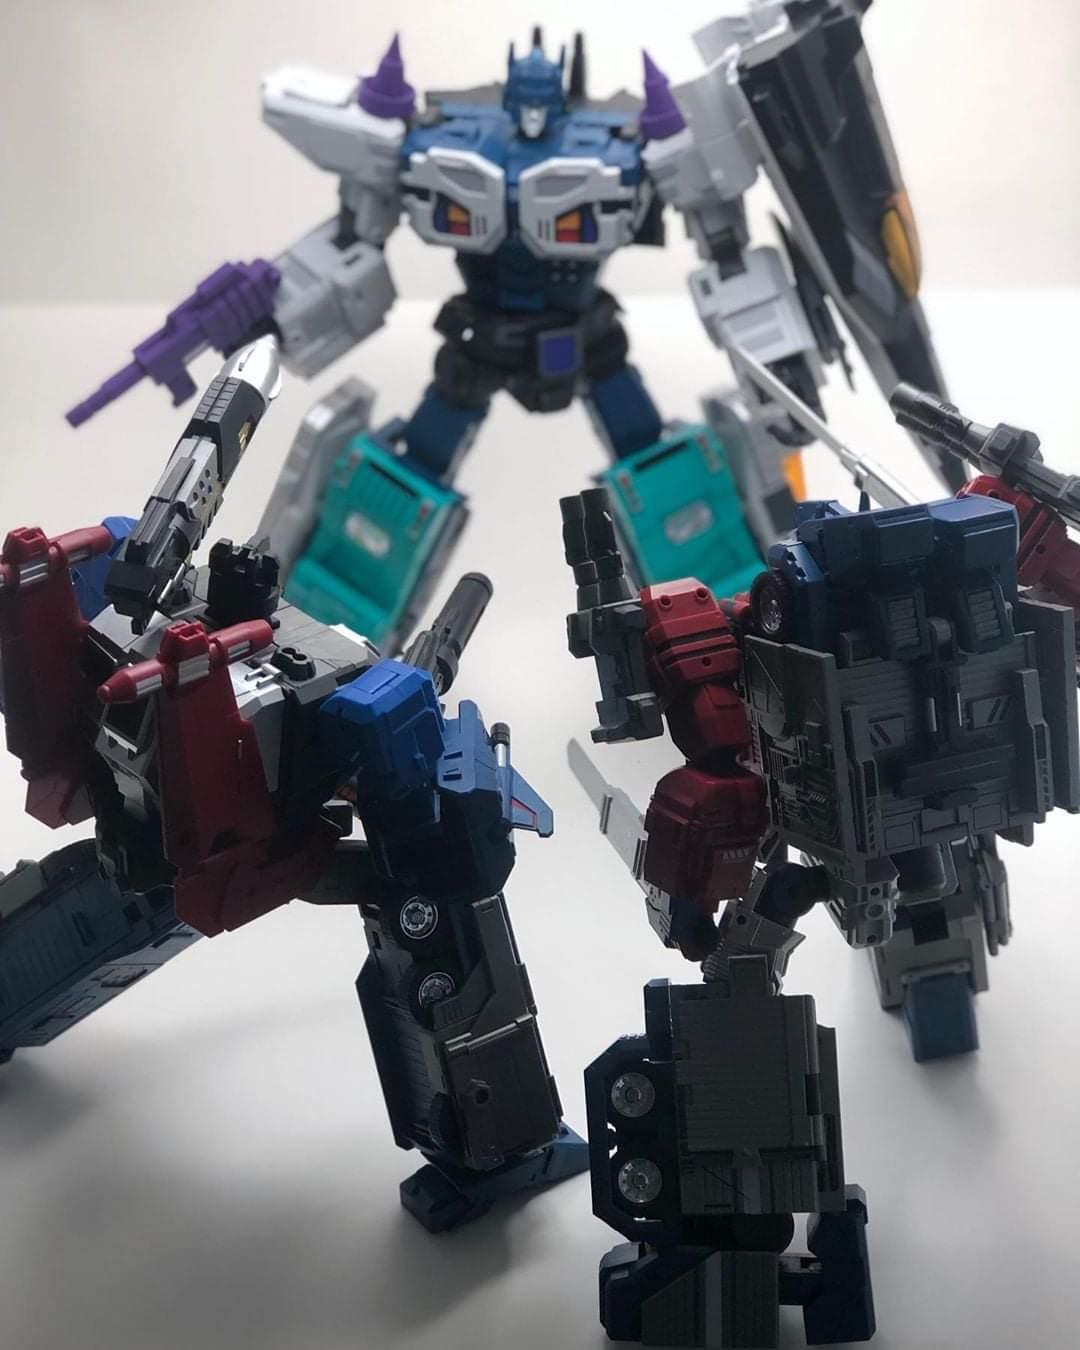 [FansHobby] Produit Tiers - MB-06 Power Baser (aka Powermaster Optimus) + MB-11 God Armour (aka Godbomber) - TF Masterforce - Page 4 NYSwvpAs_o